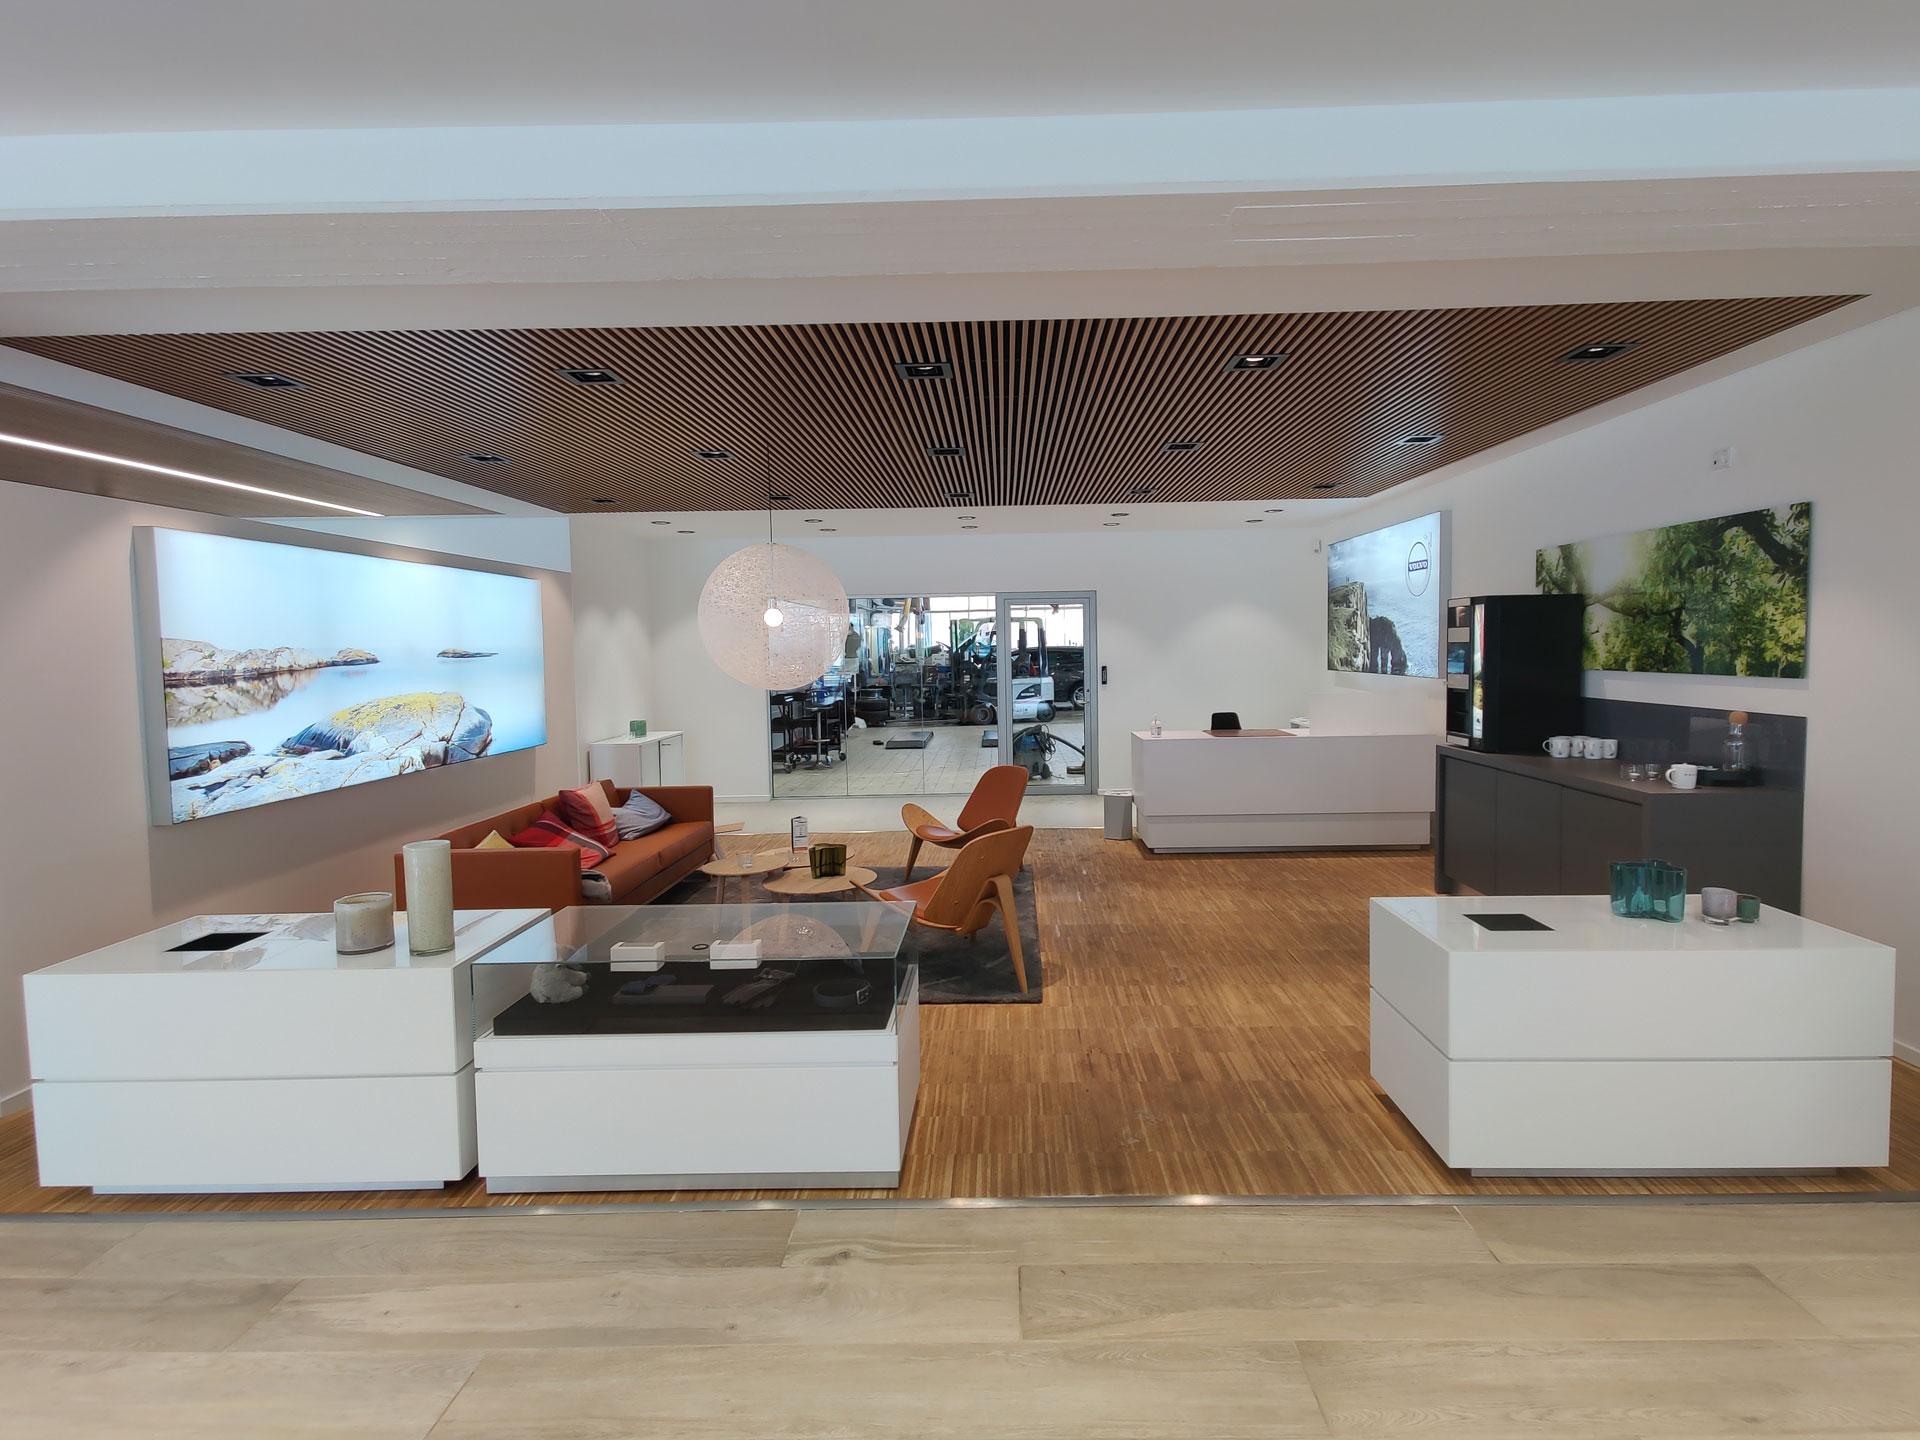 Volvo lounge hos Andersen Biler Gladsaxe 4